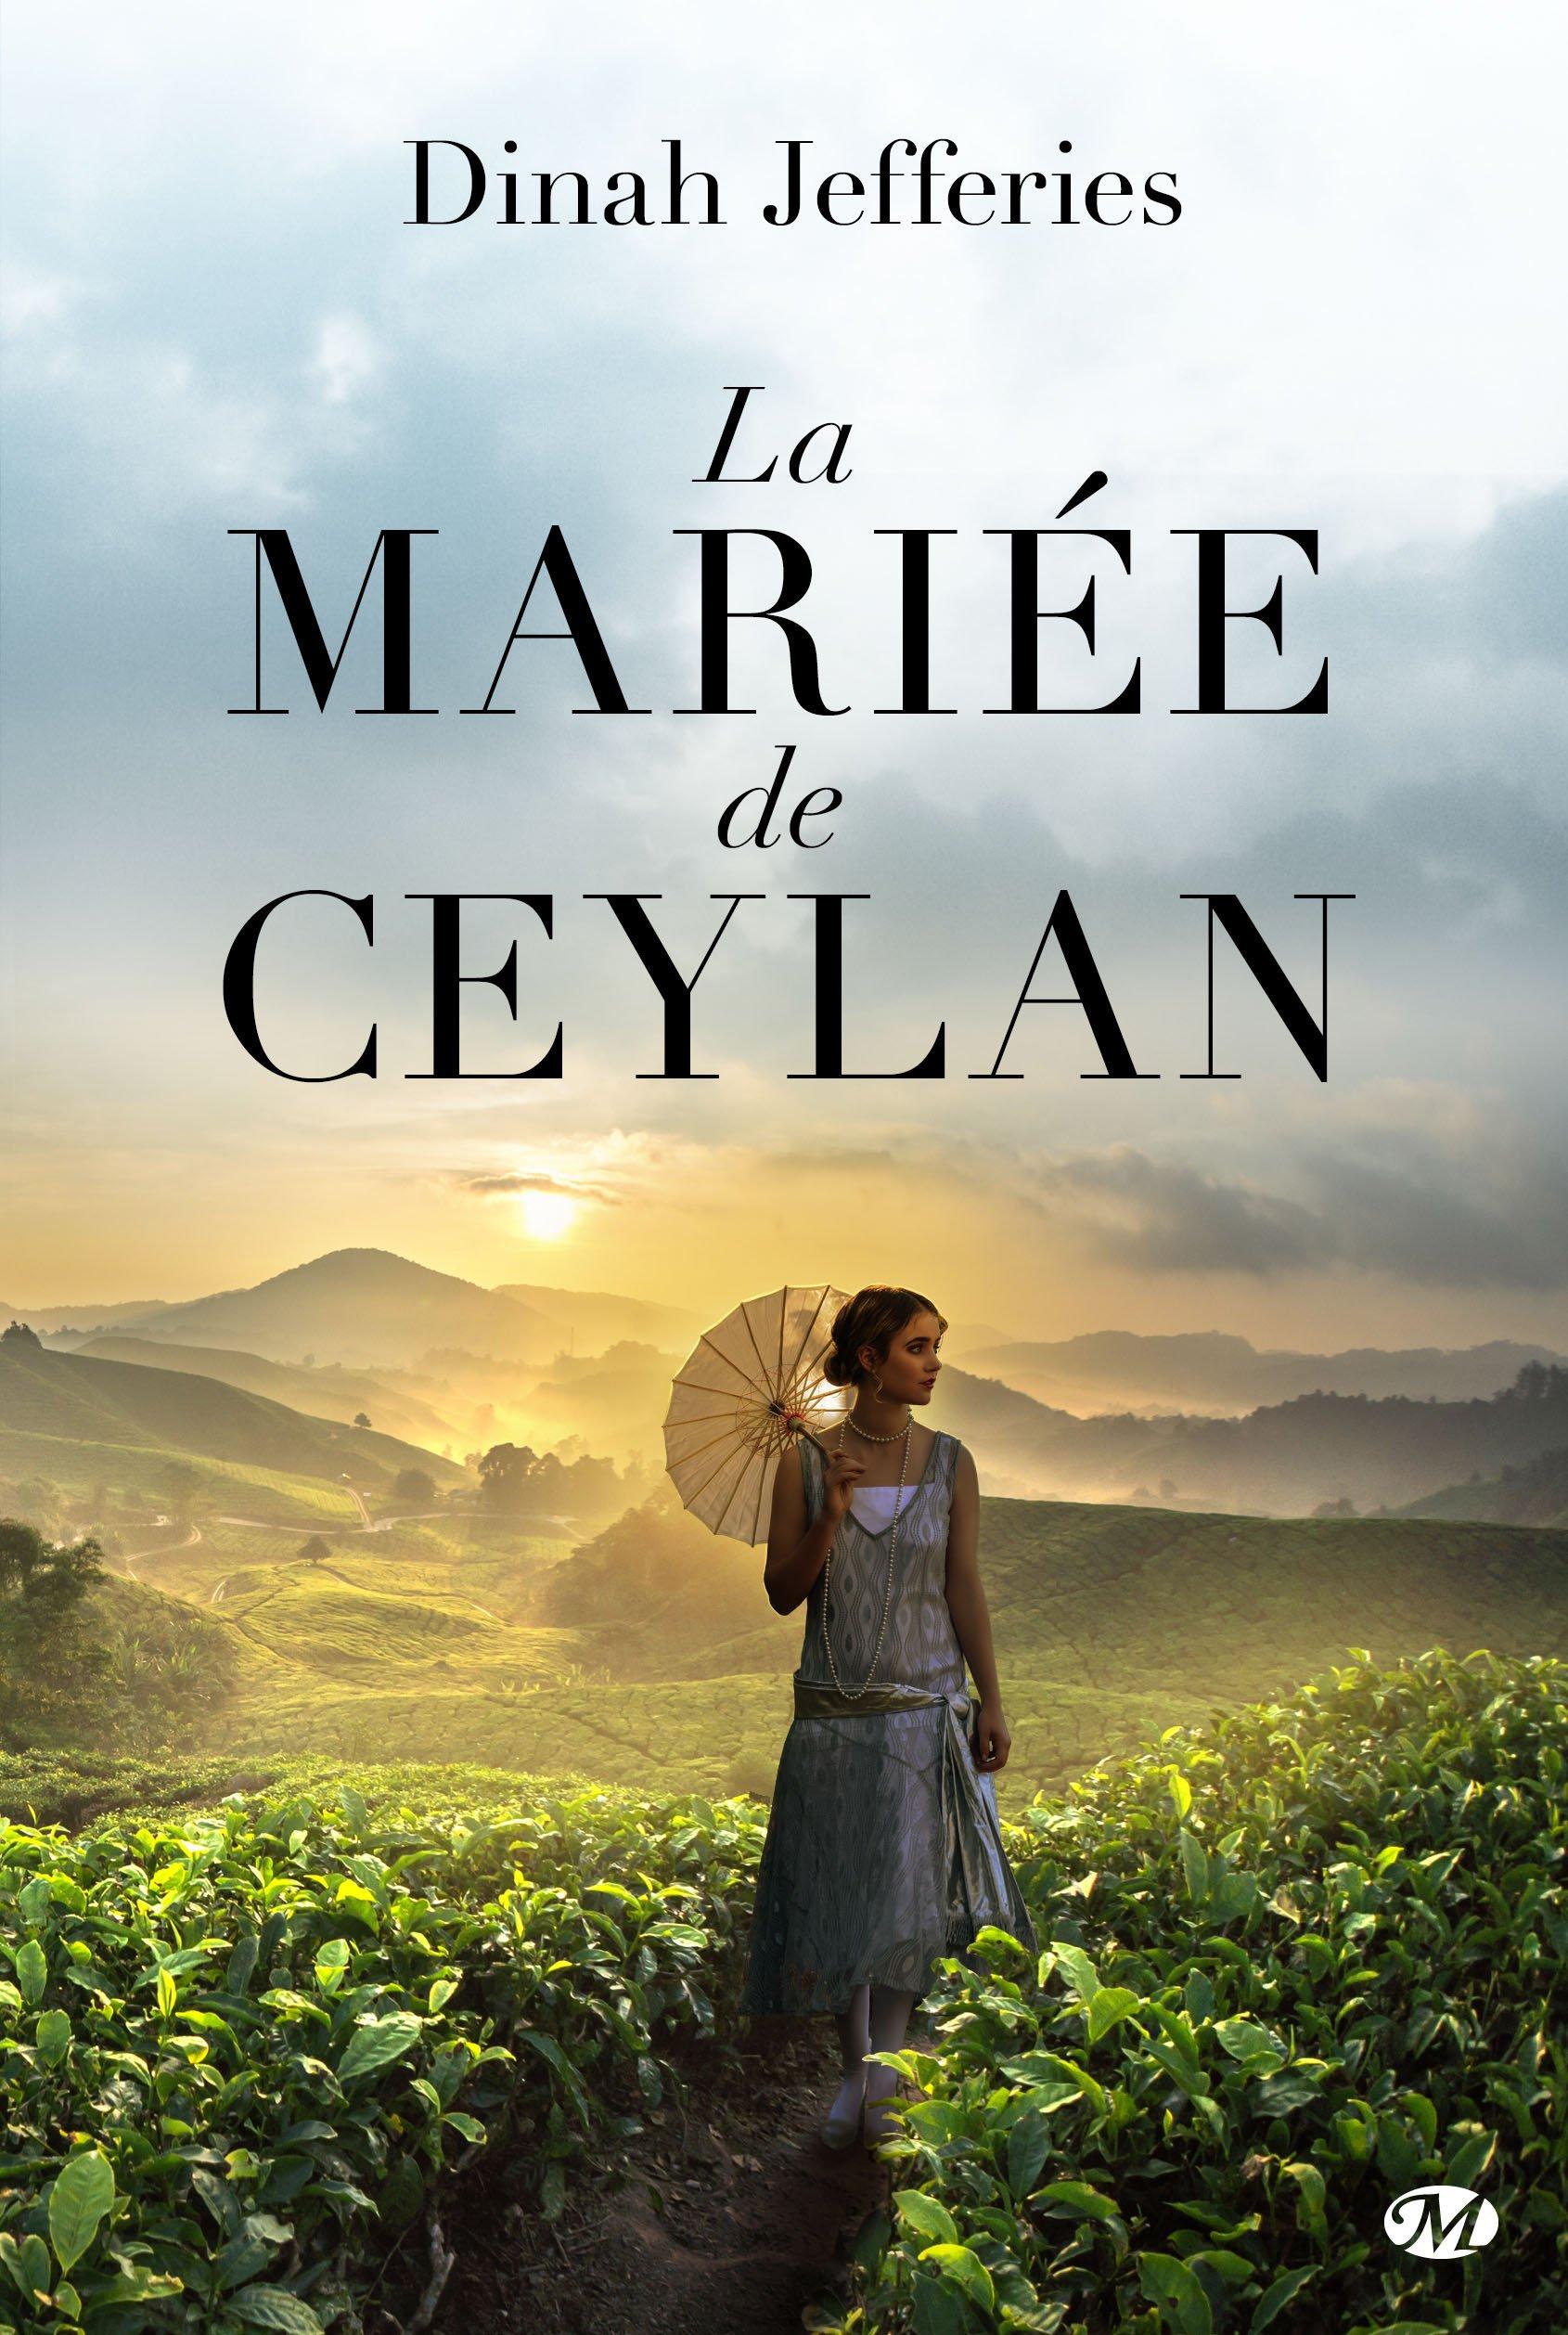 La Mariée de Ceylan de Dinah Jefferies 91Bw9l%2BYaSL